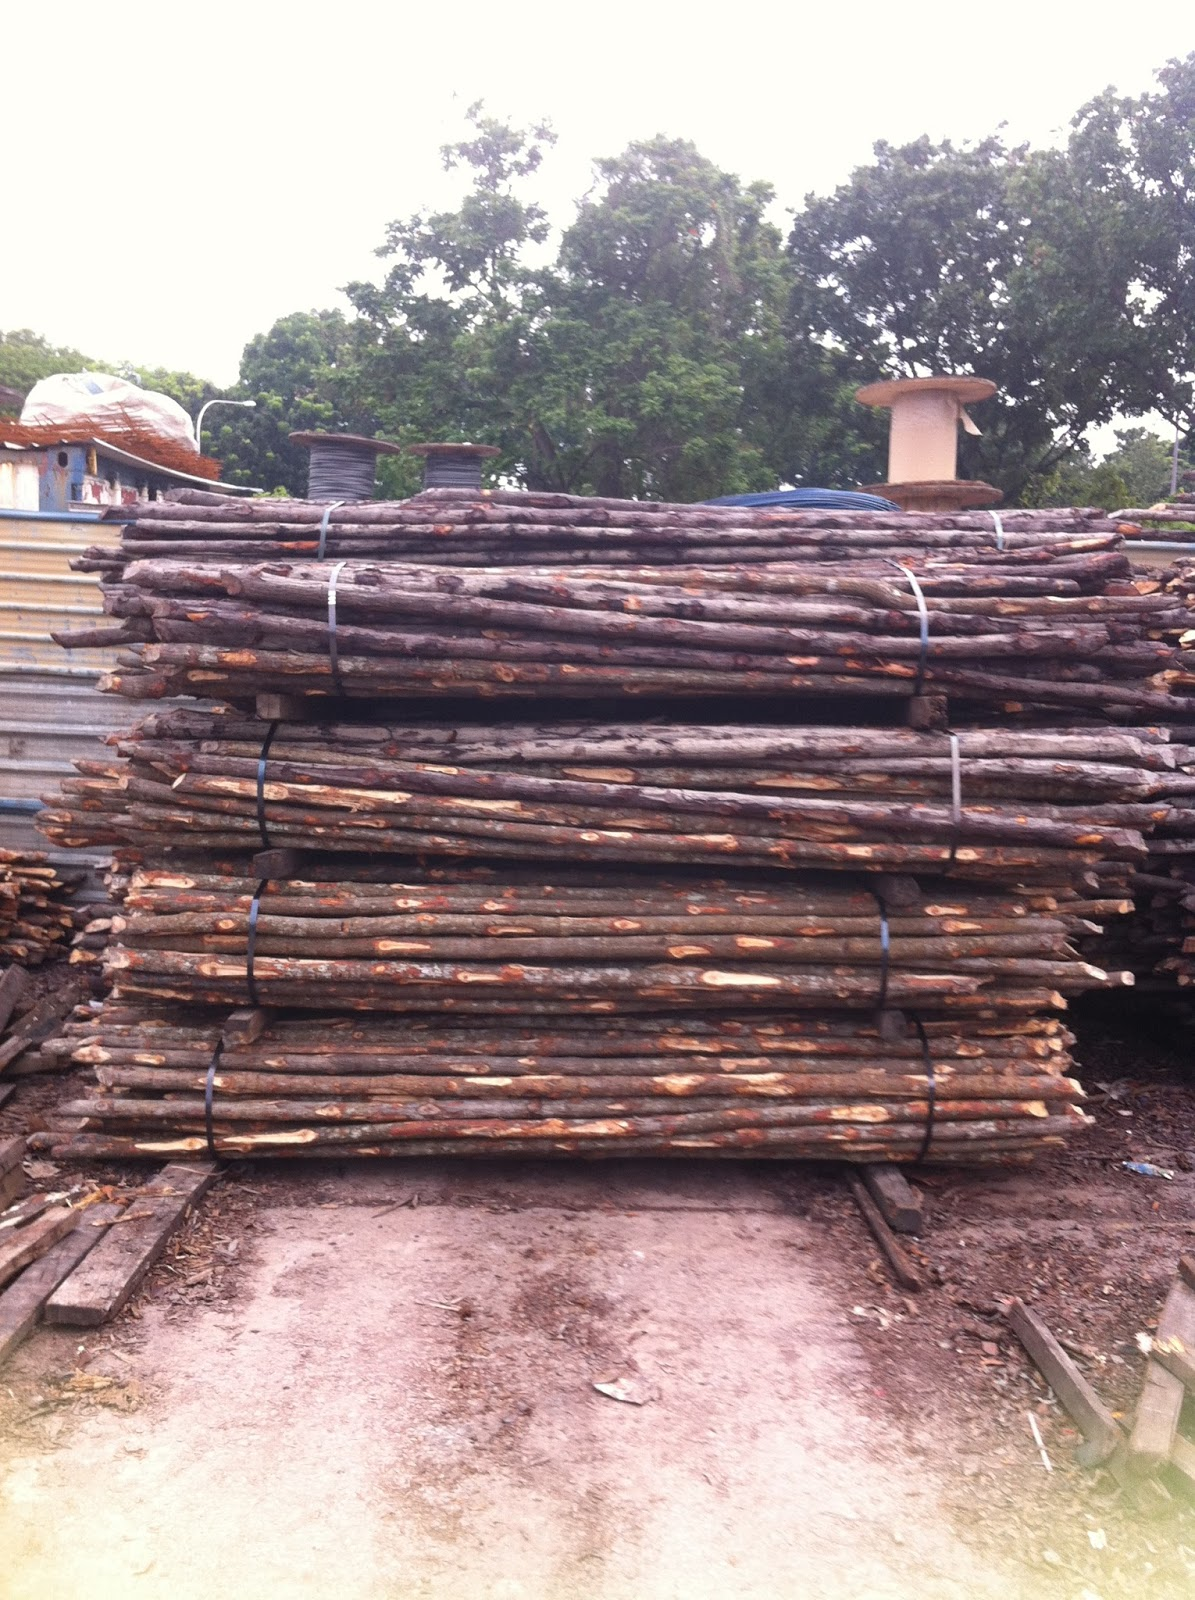 Yong hua heng bakau piling wood scaffolding wood poles for Wood piling foundation